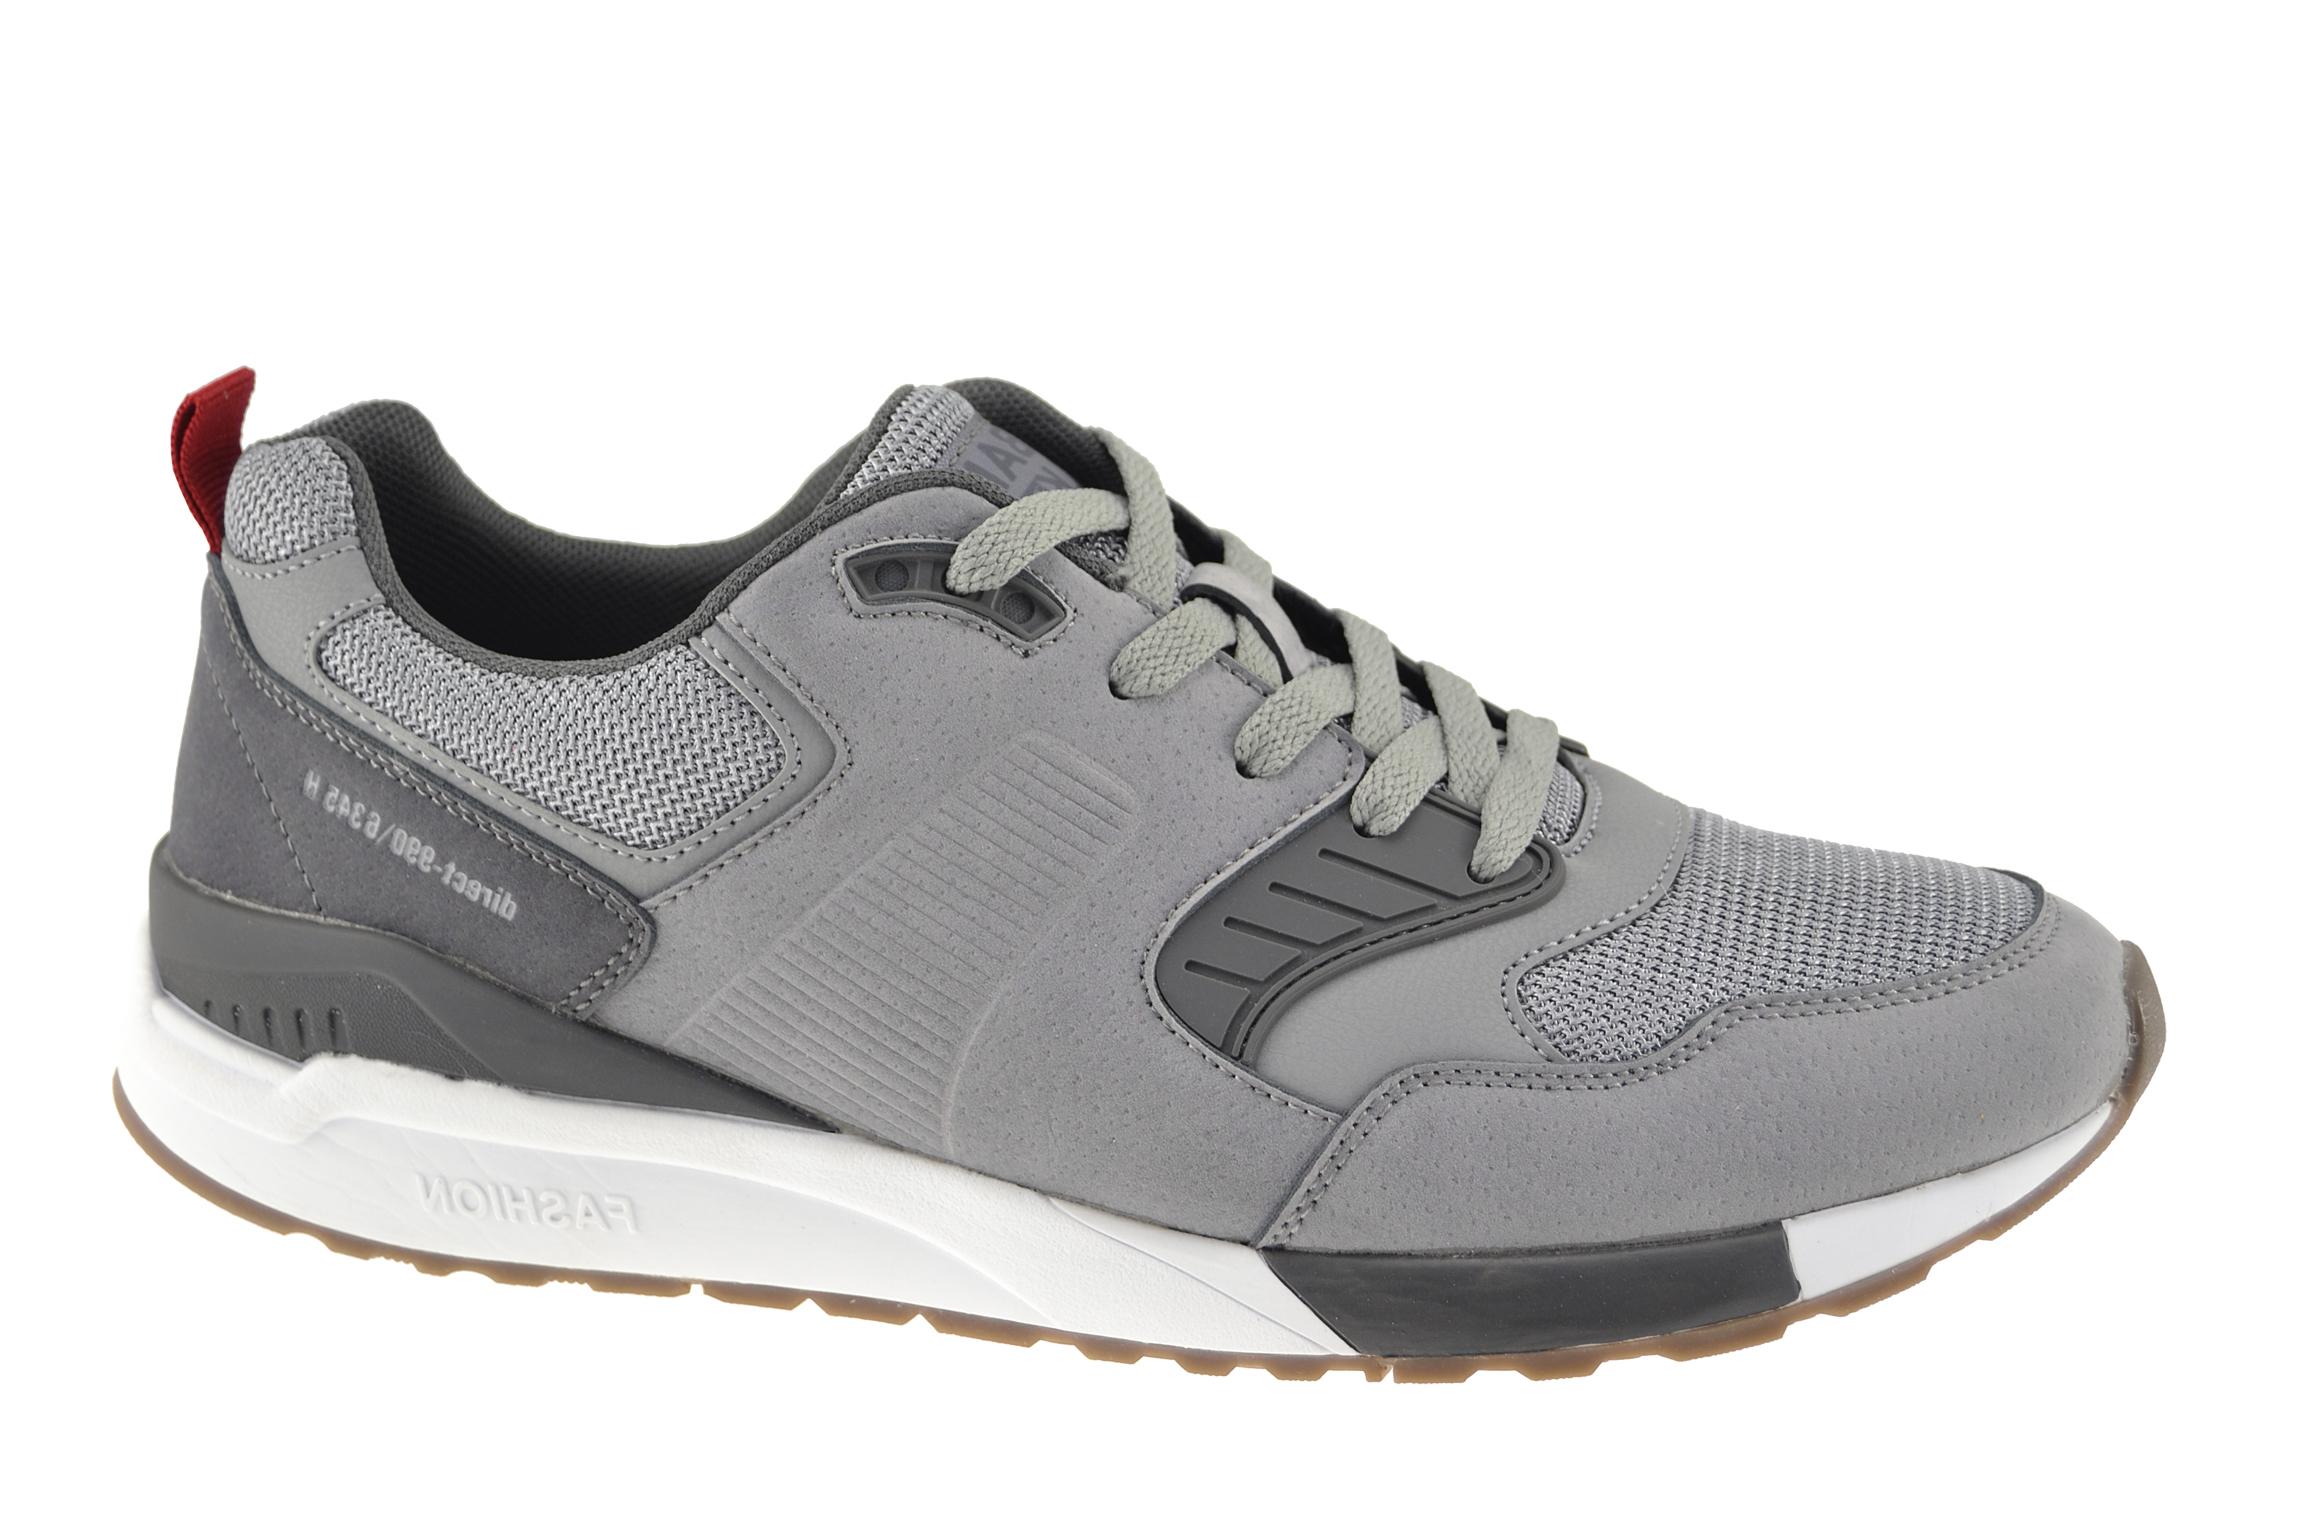 28233-HOBER gris